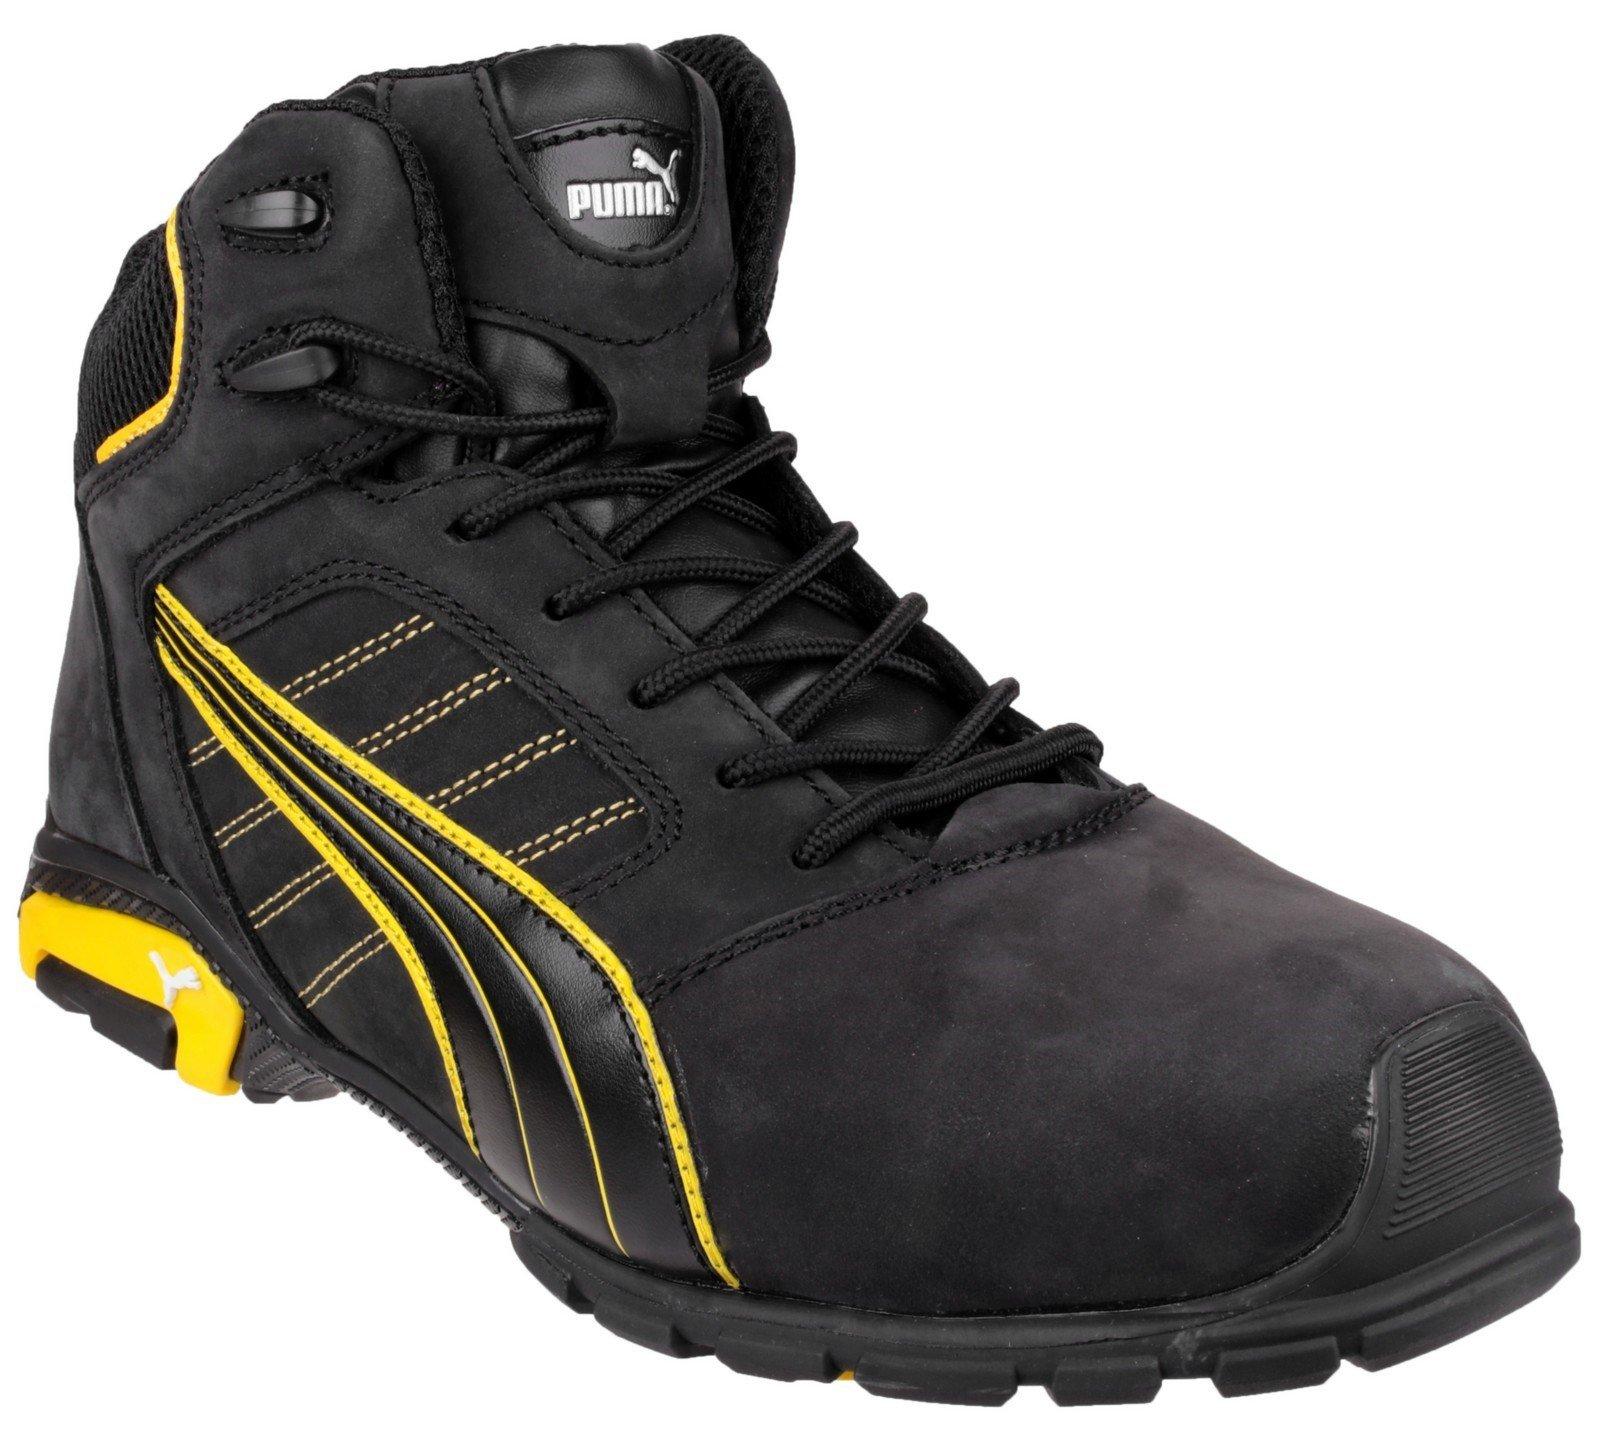 Puma Safety Unisex Amsterdam Mid Boot Black 23090 - Black 6